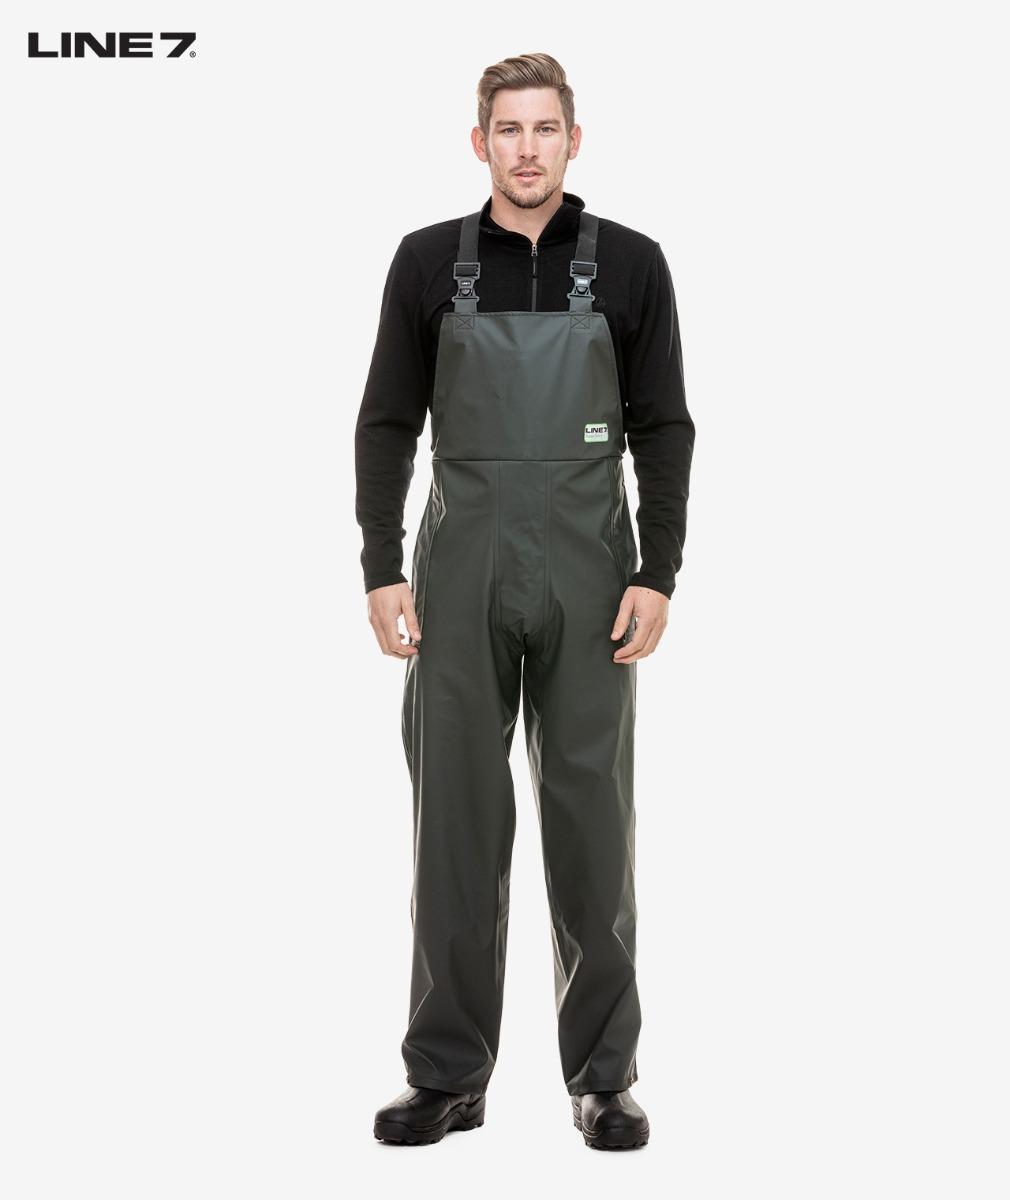 Line 7 Men's Aqua Dairy Waterproof Bib Trouser